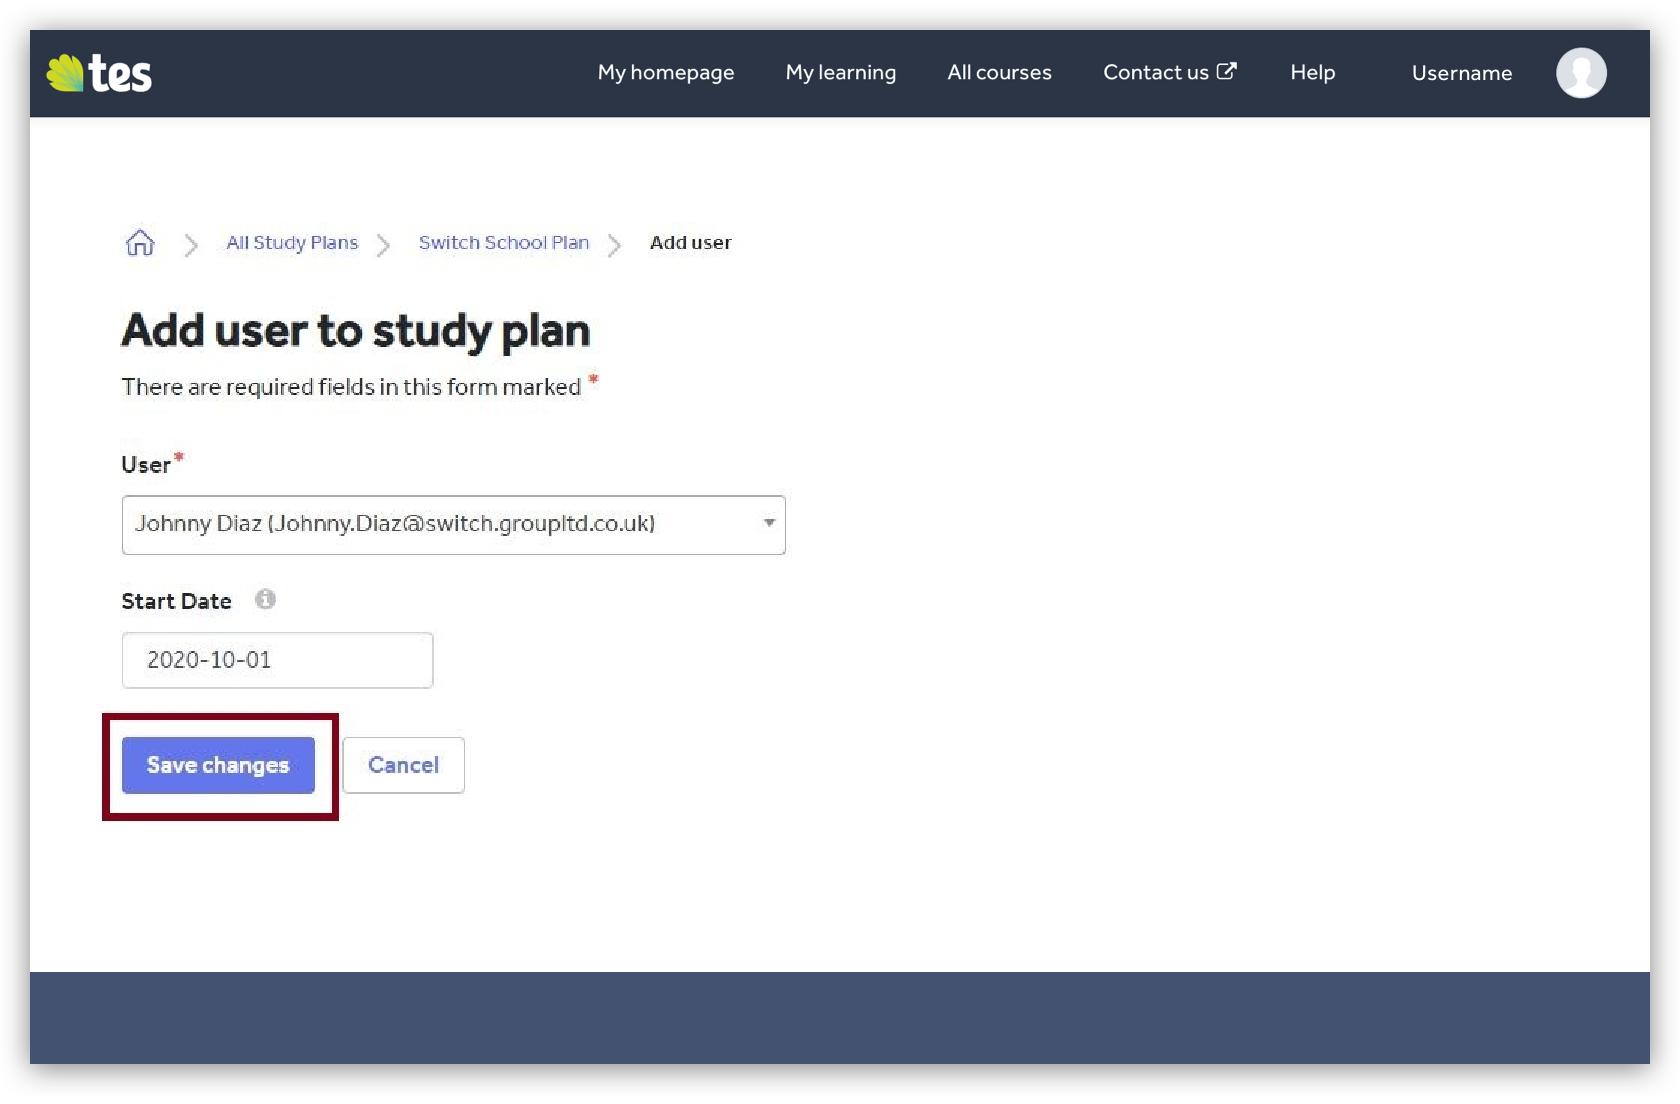 Add user to study plan image